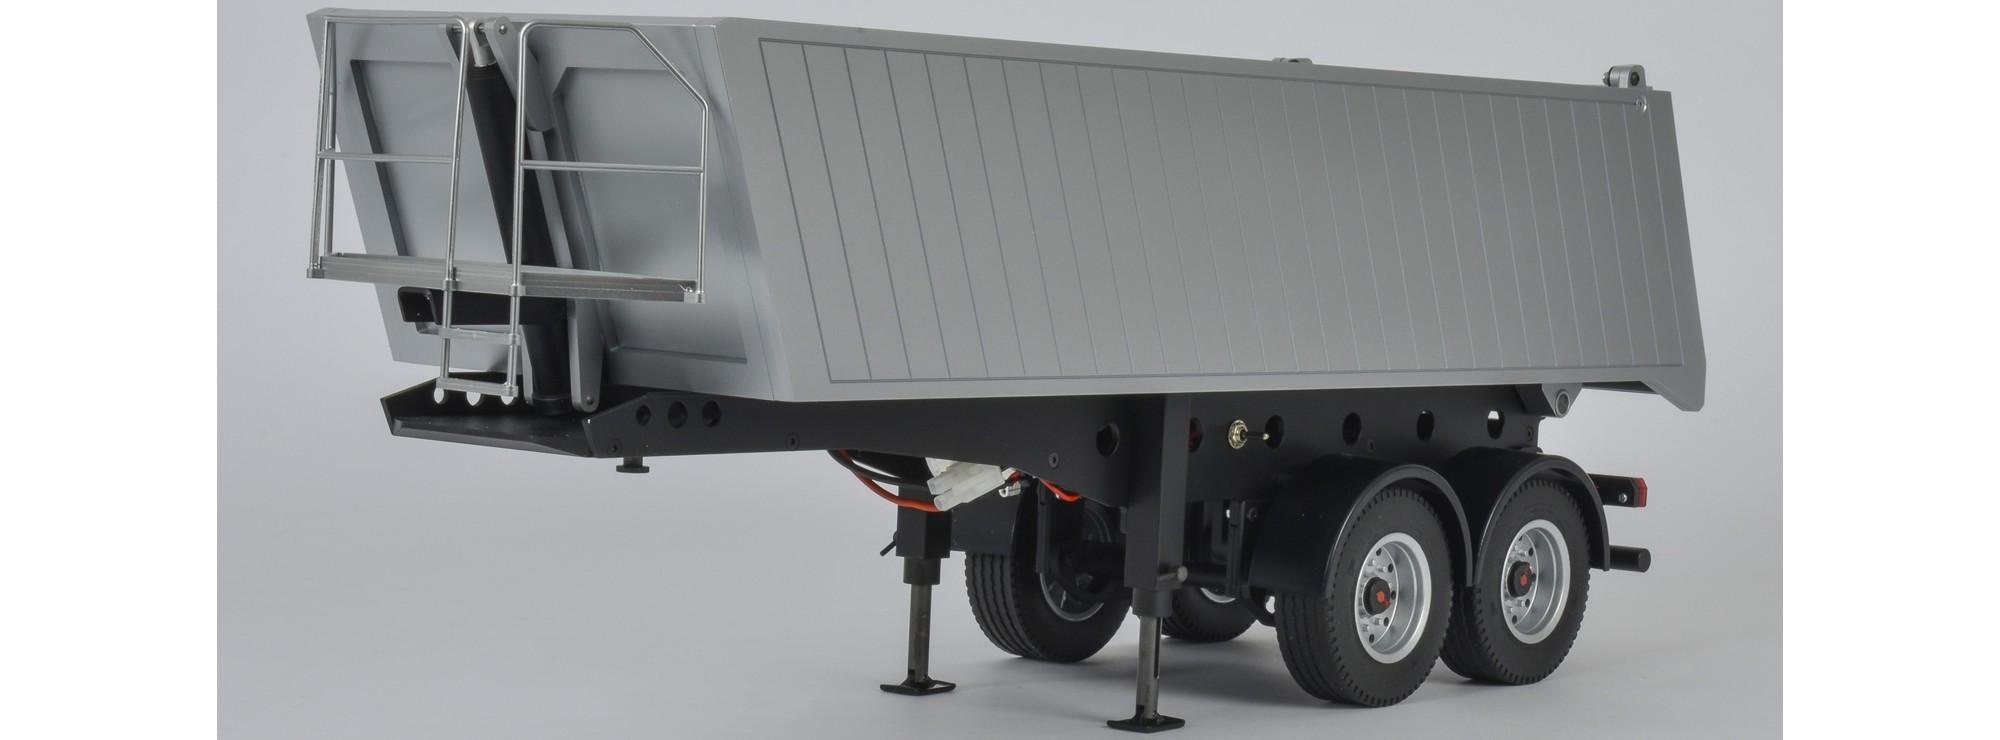 Super CARSON 500907312 2-Achs Muldenkipper Sattelauflieger   RC LKW &ZJ_48